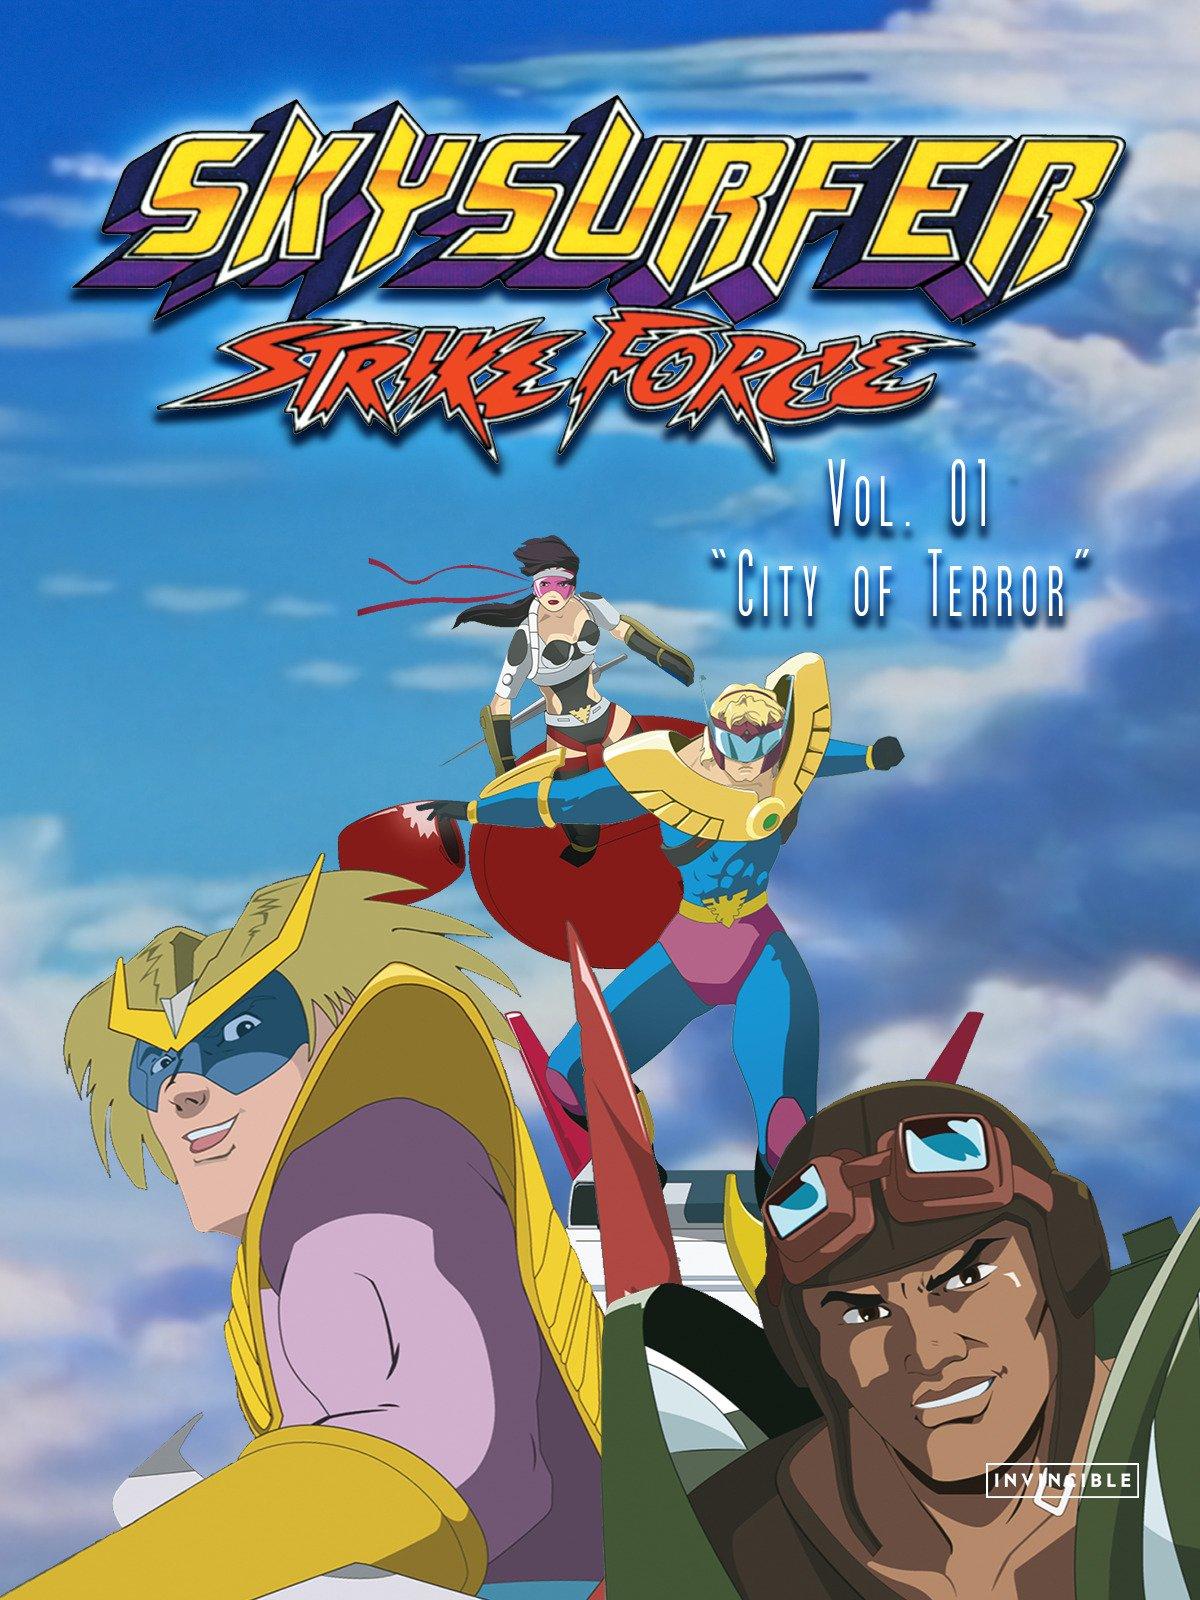 Skysurfer Strike Force Vol. 01City of Terror on Amazon Prime Video UK